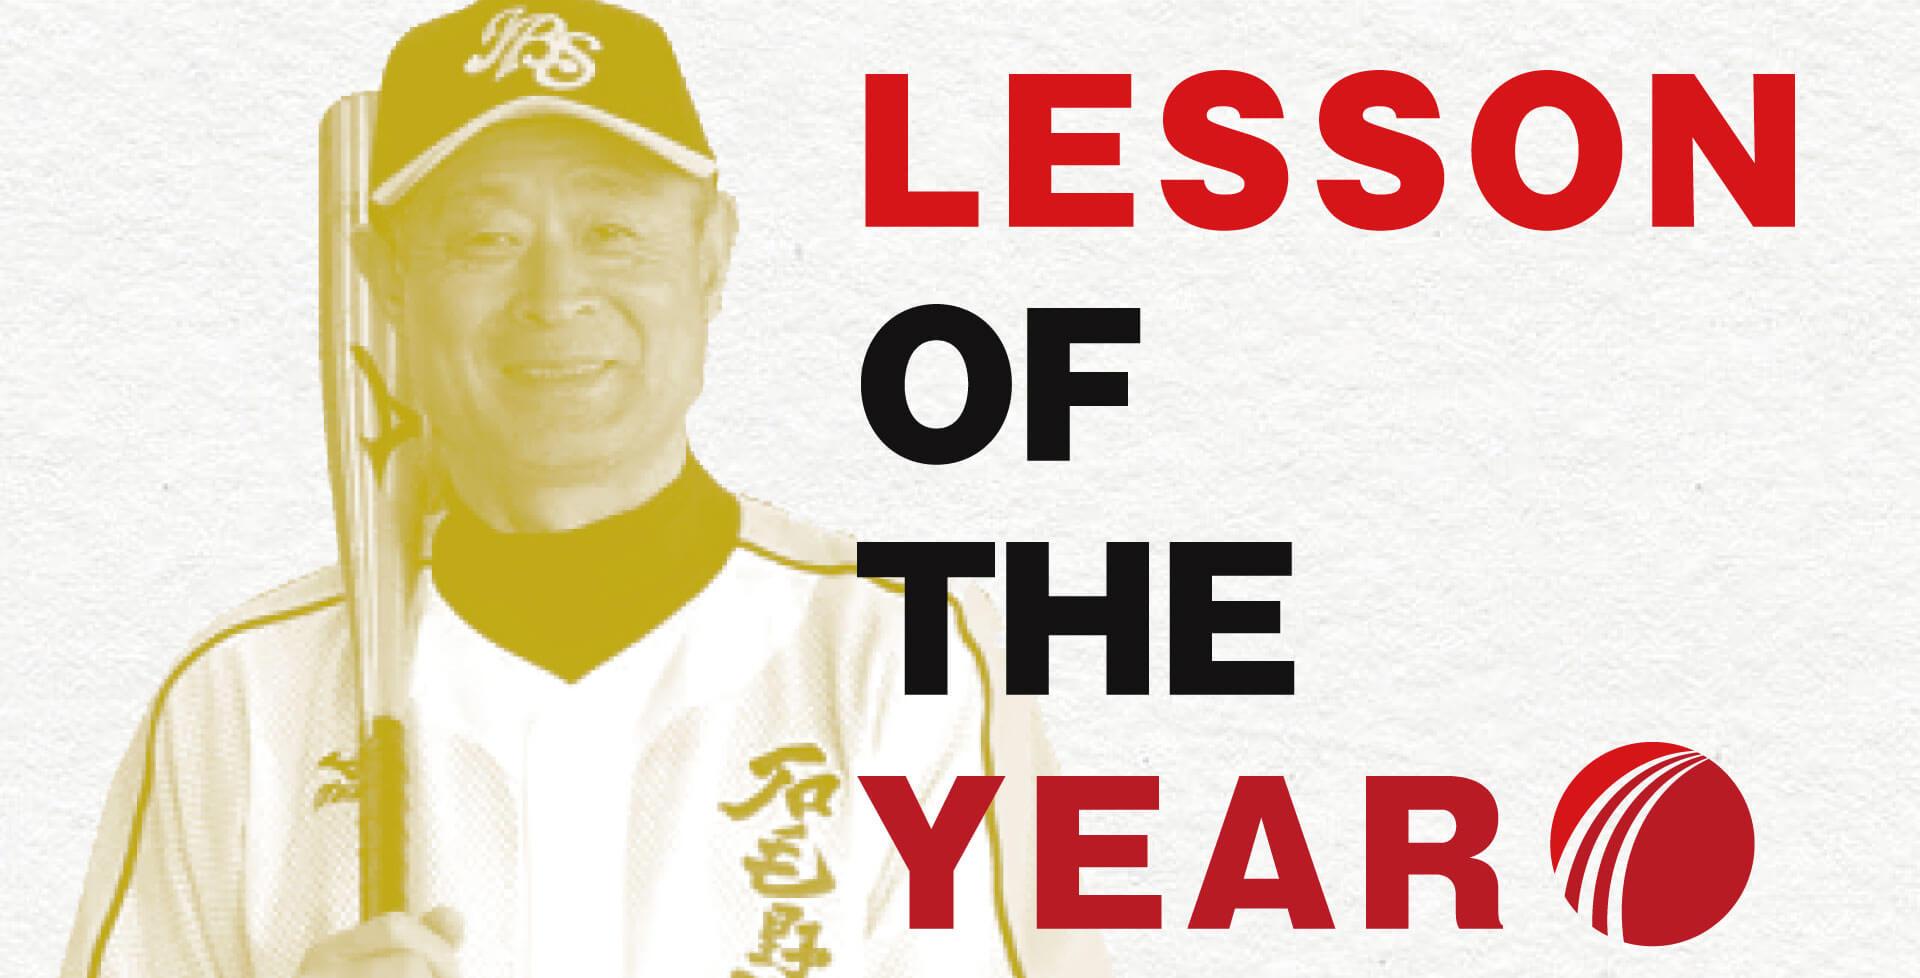 LESSON OF THE YEARのキービジュアル%